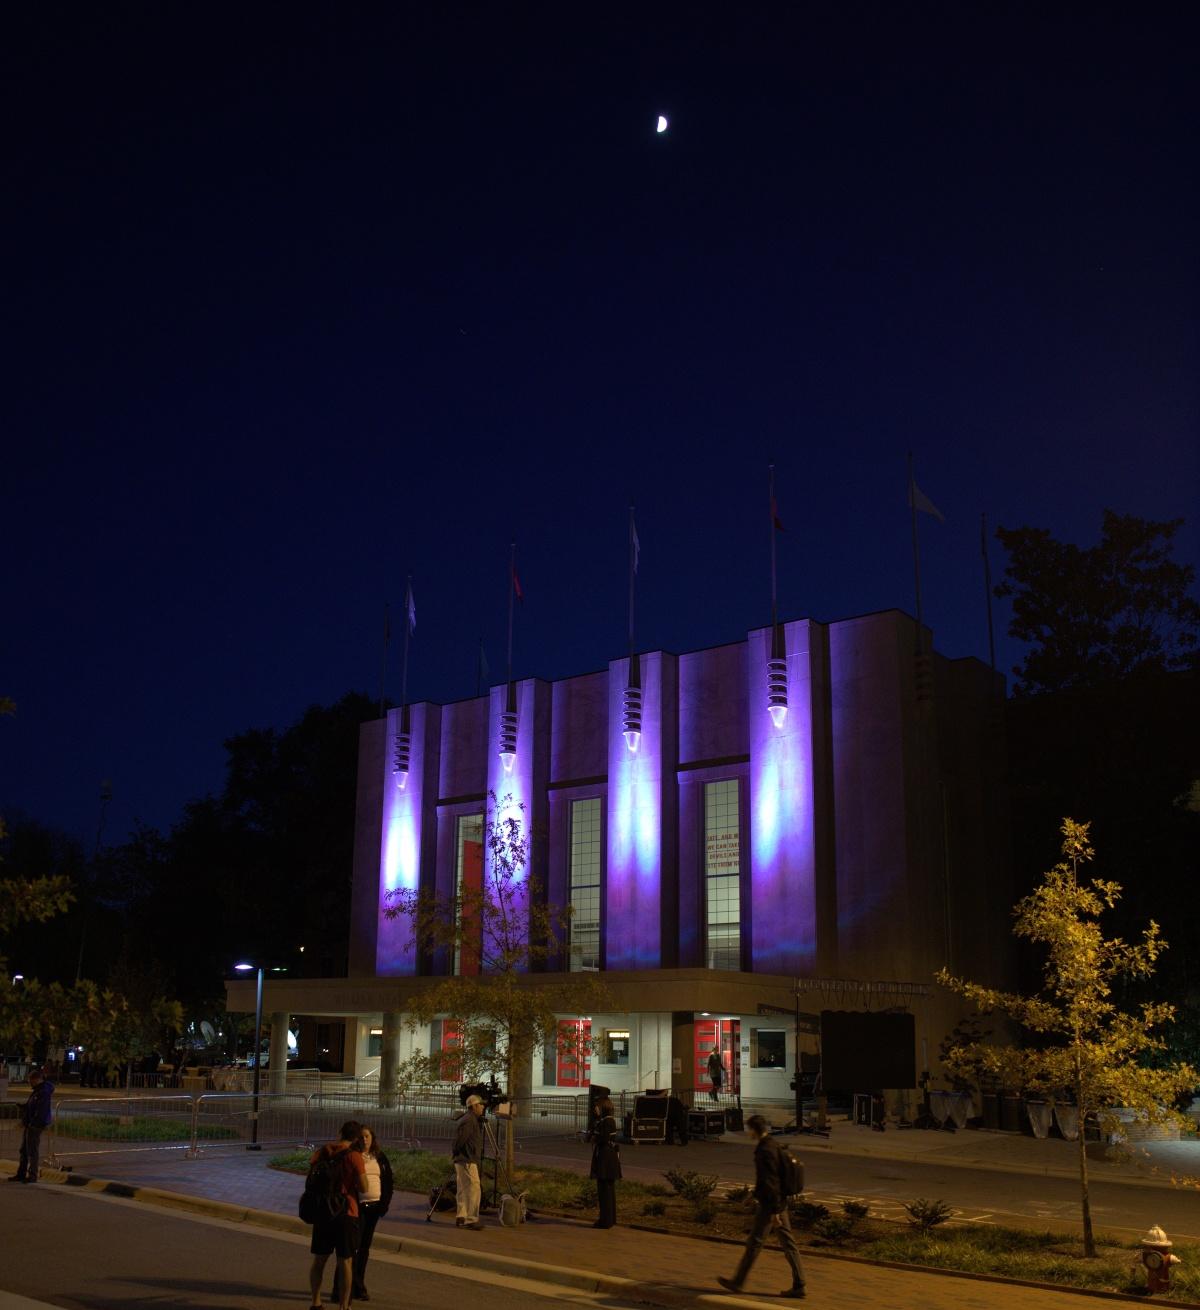 Place ~ North Carolina State University [NCSU], Raleigh, North Carolina,11/07